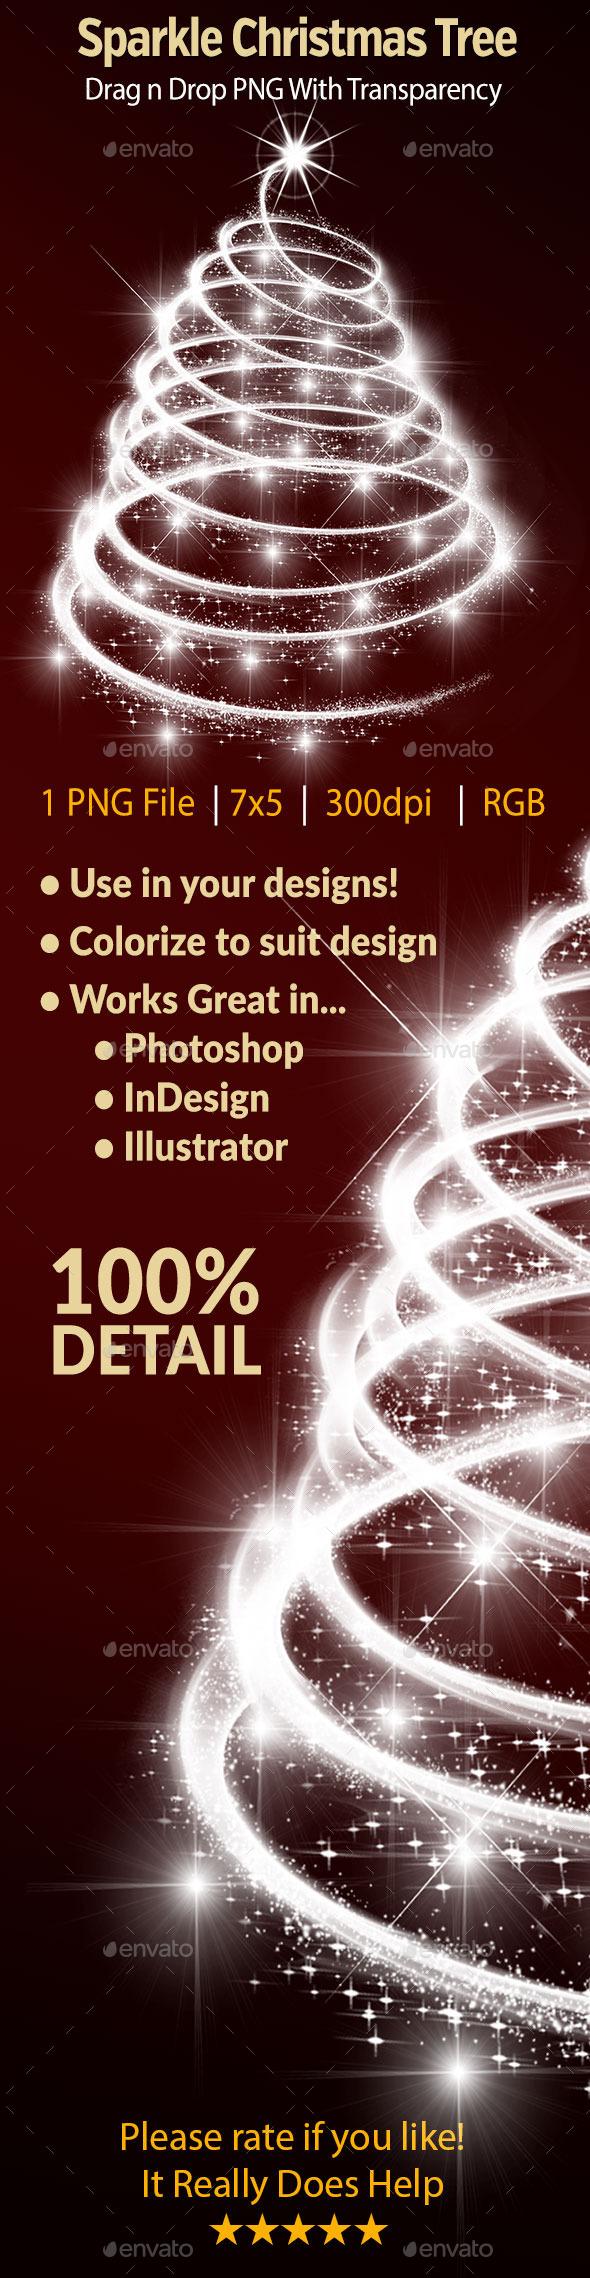 GraphicRiver Sparkle Christmas Tree 9537687